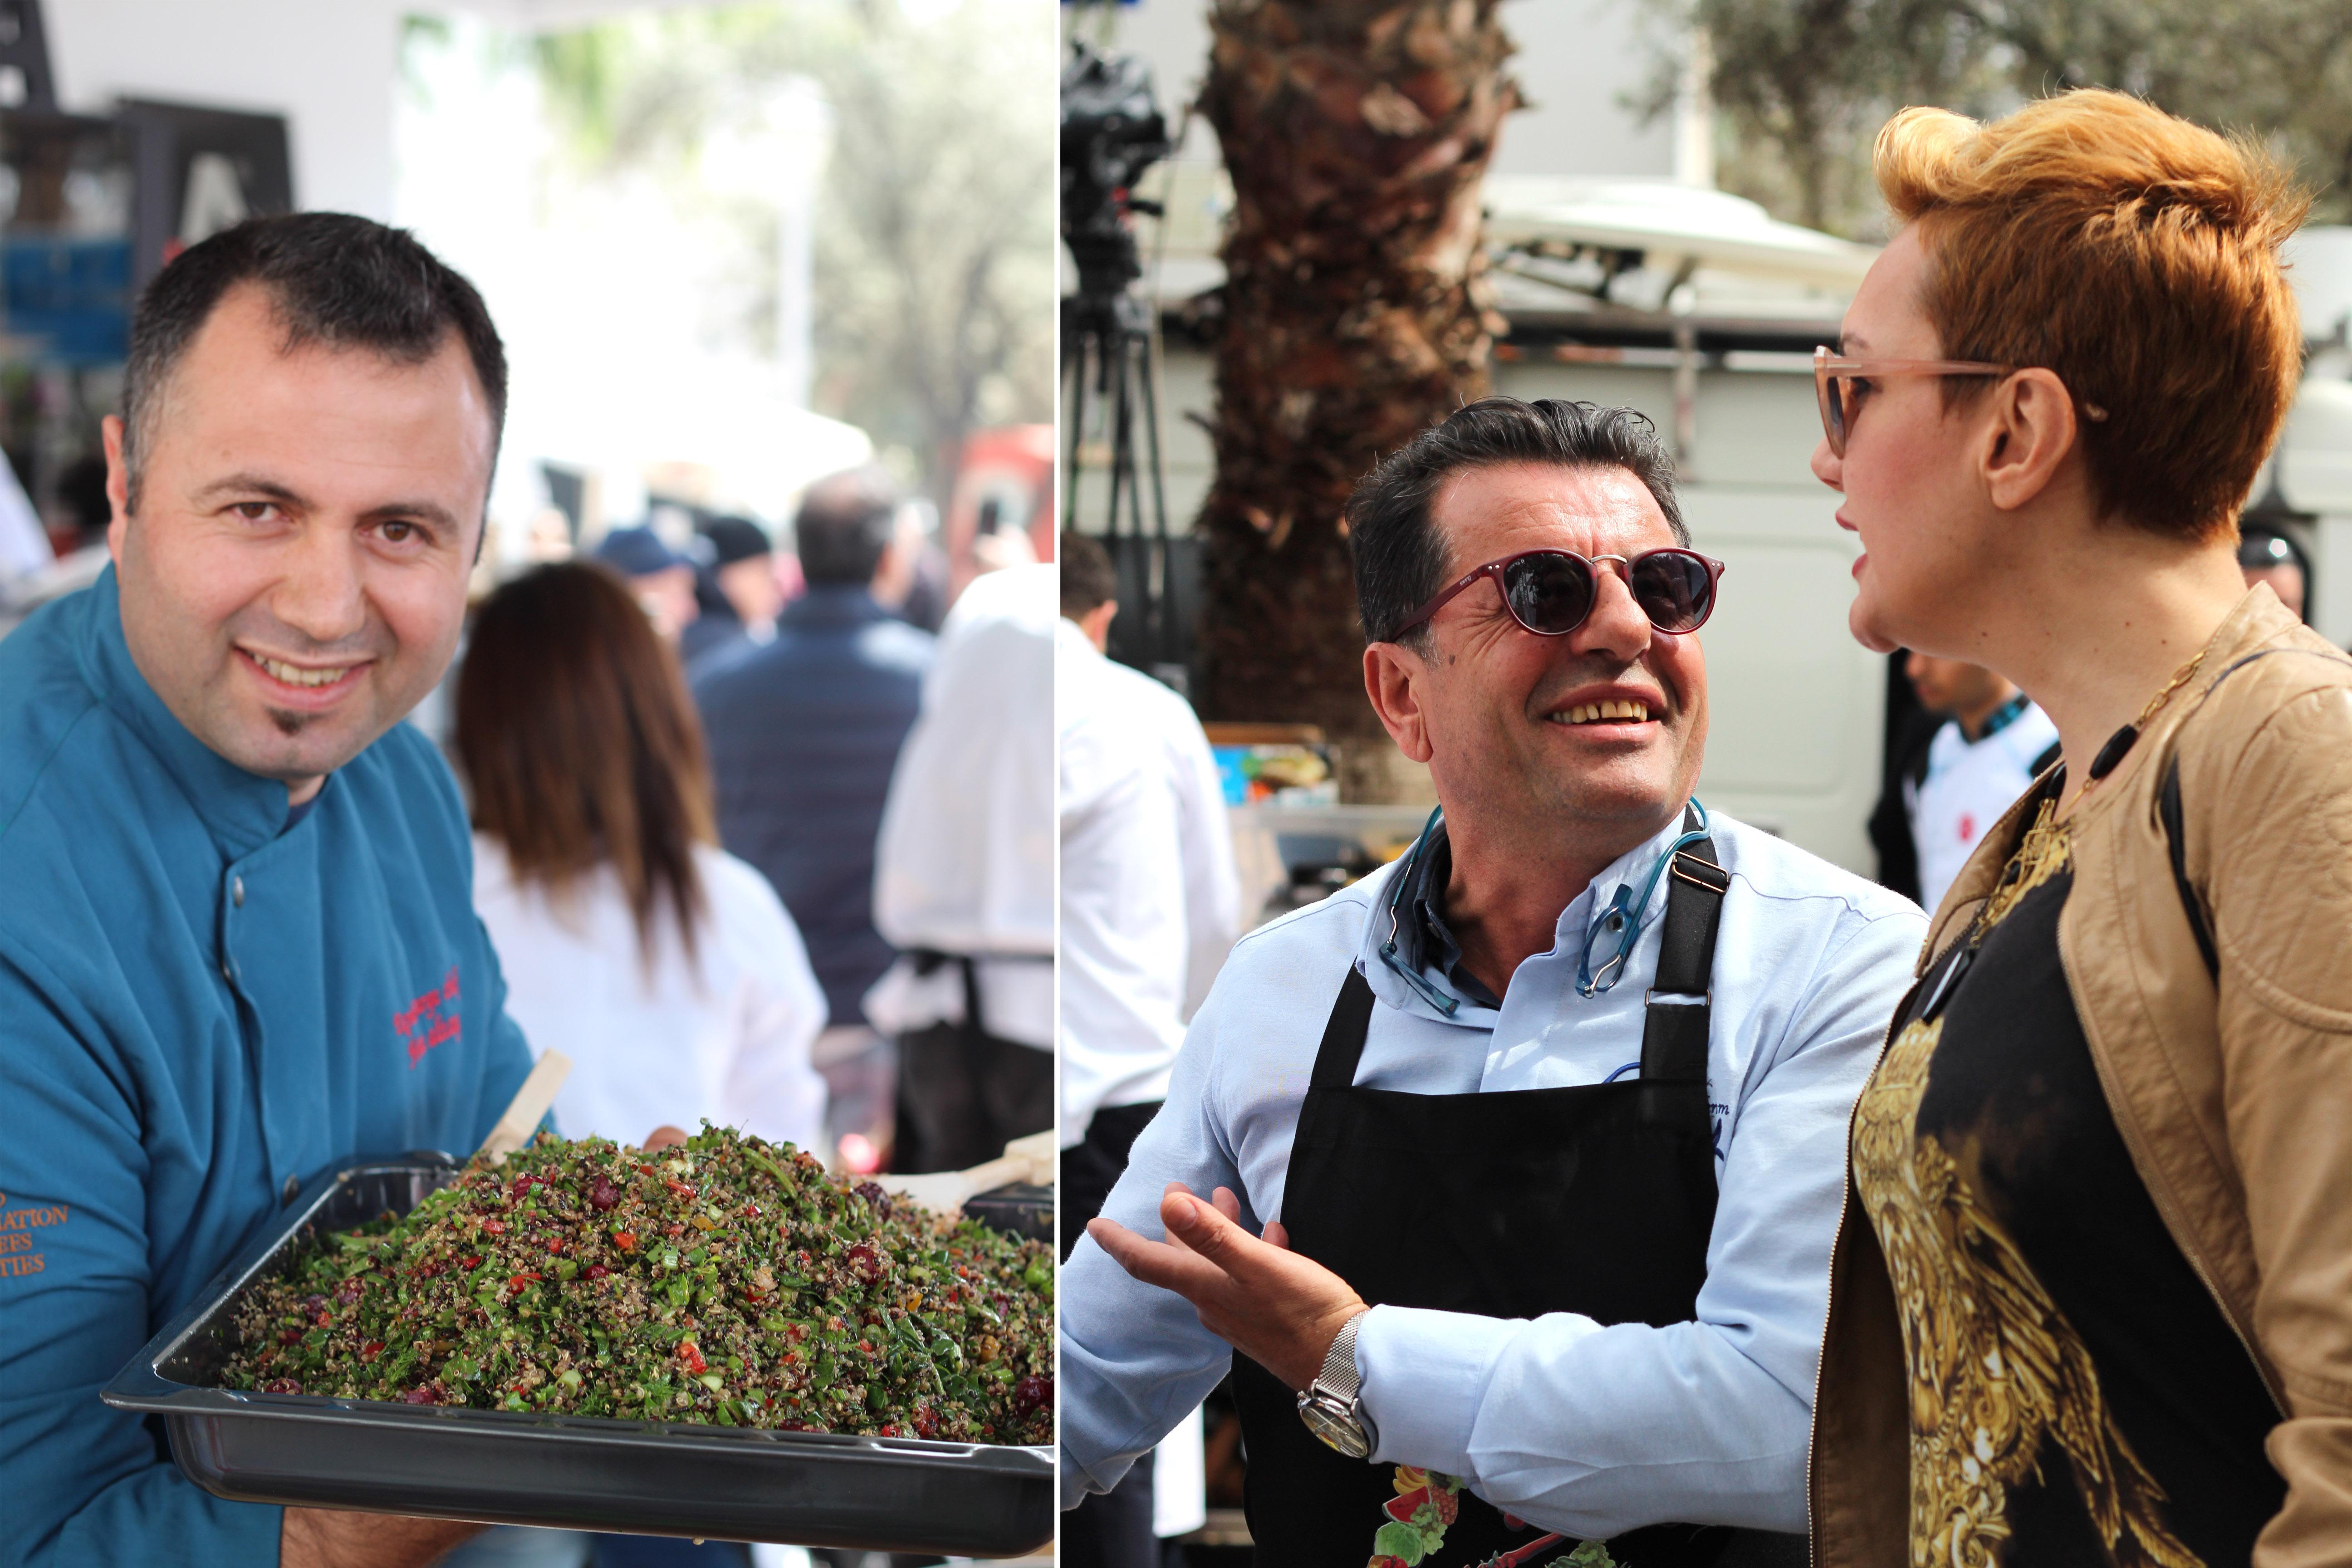 bodrum-aci-ot-festivali-kinoa-salatasi-usengec-sef